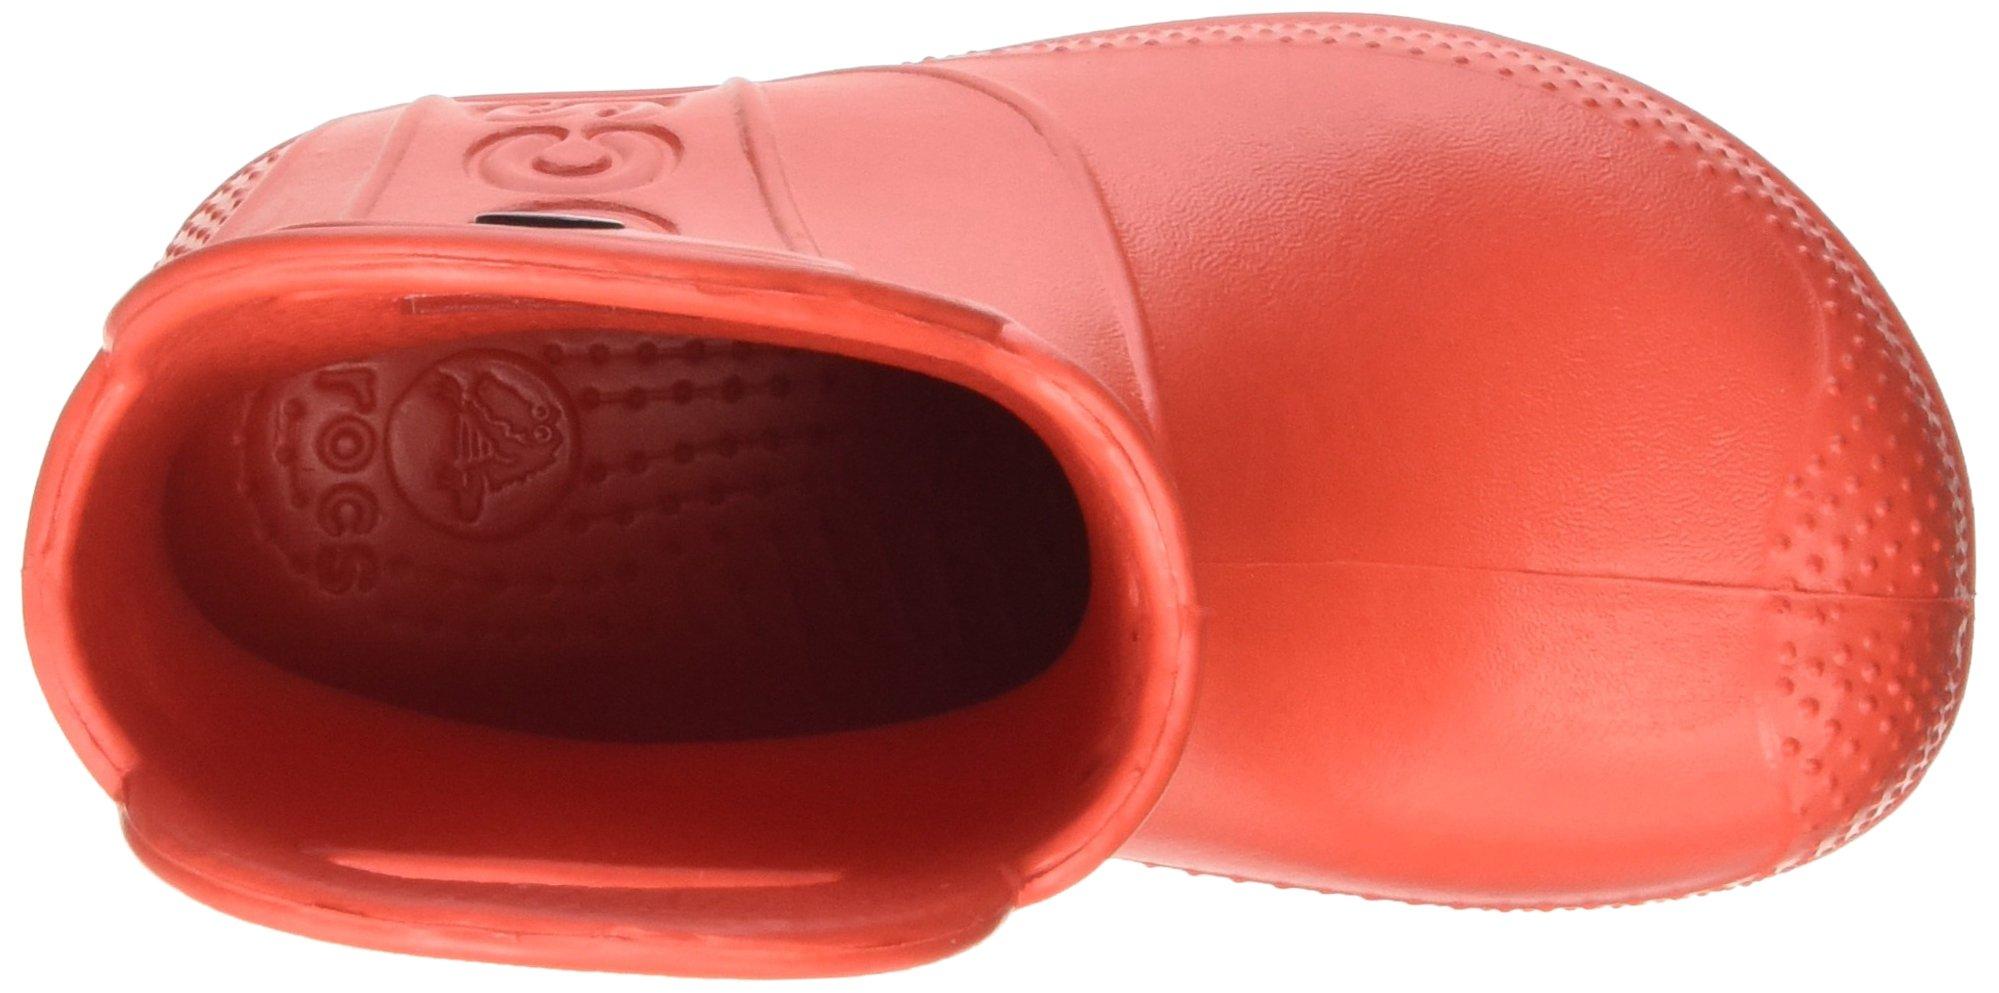 Crocs Kids' Handle It Rain Boot, Flame, 8 M US Toddler by Crocs (Image #8)